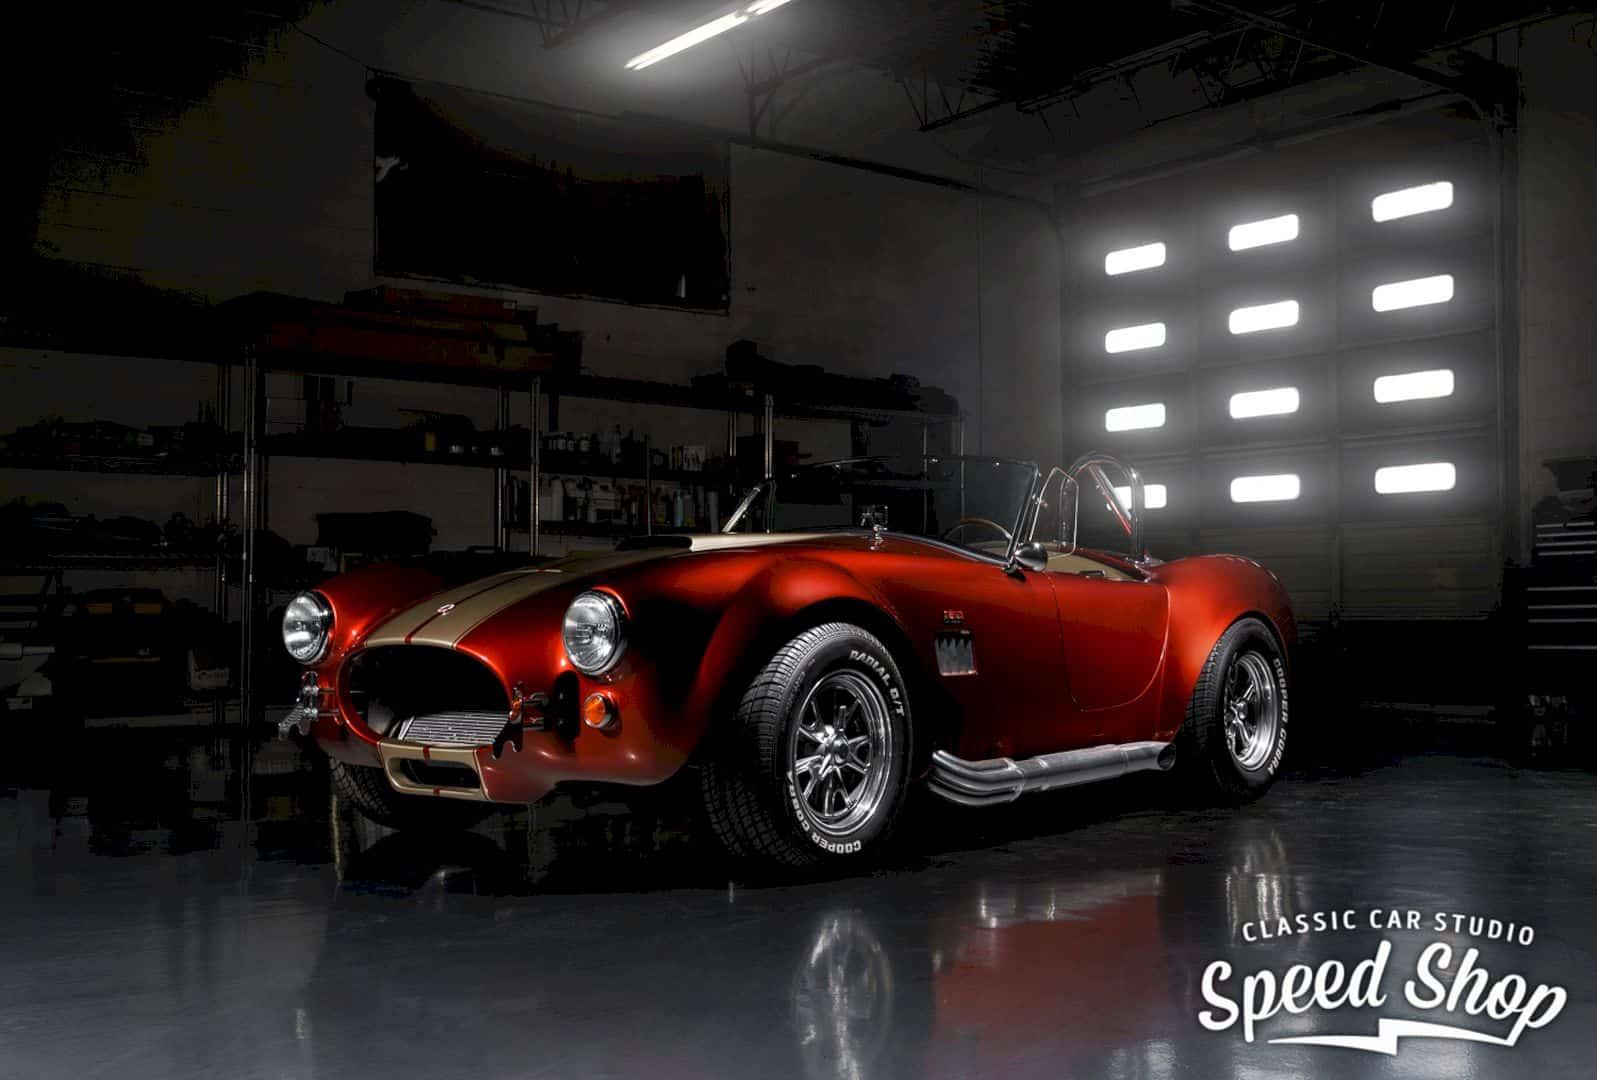 1965 Factory 5 Cobra By Classic Car Studio Shop 7